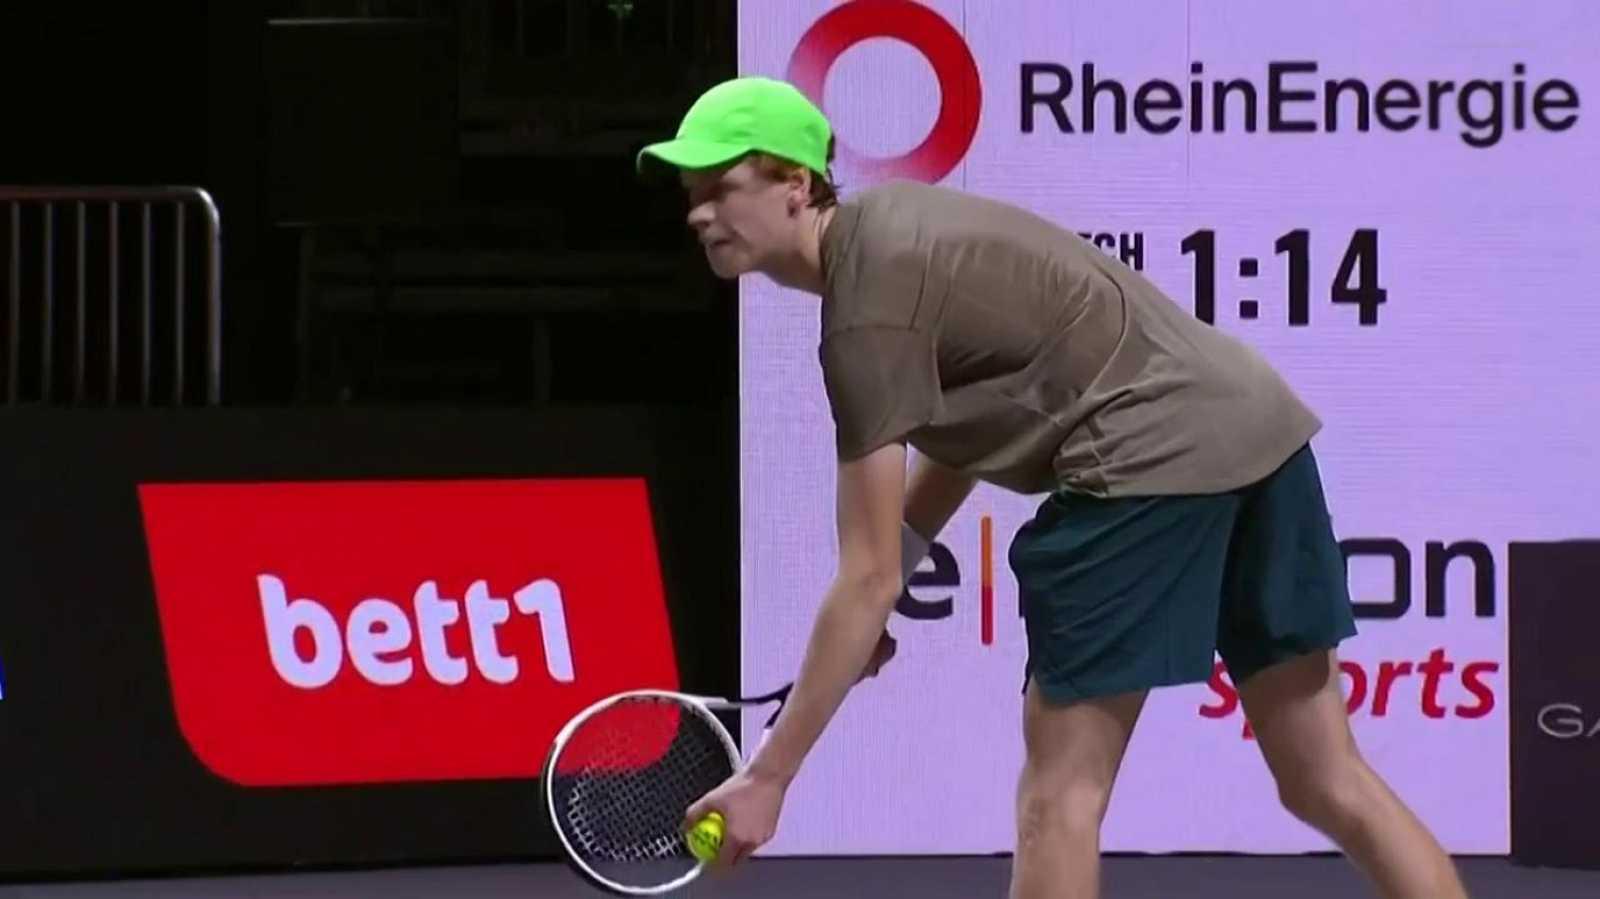 Tenis - ATP 250 Torneo Colonia (II): Pierre-Hugues Herbert - Jannik Sinner - ver ahora